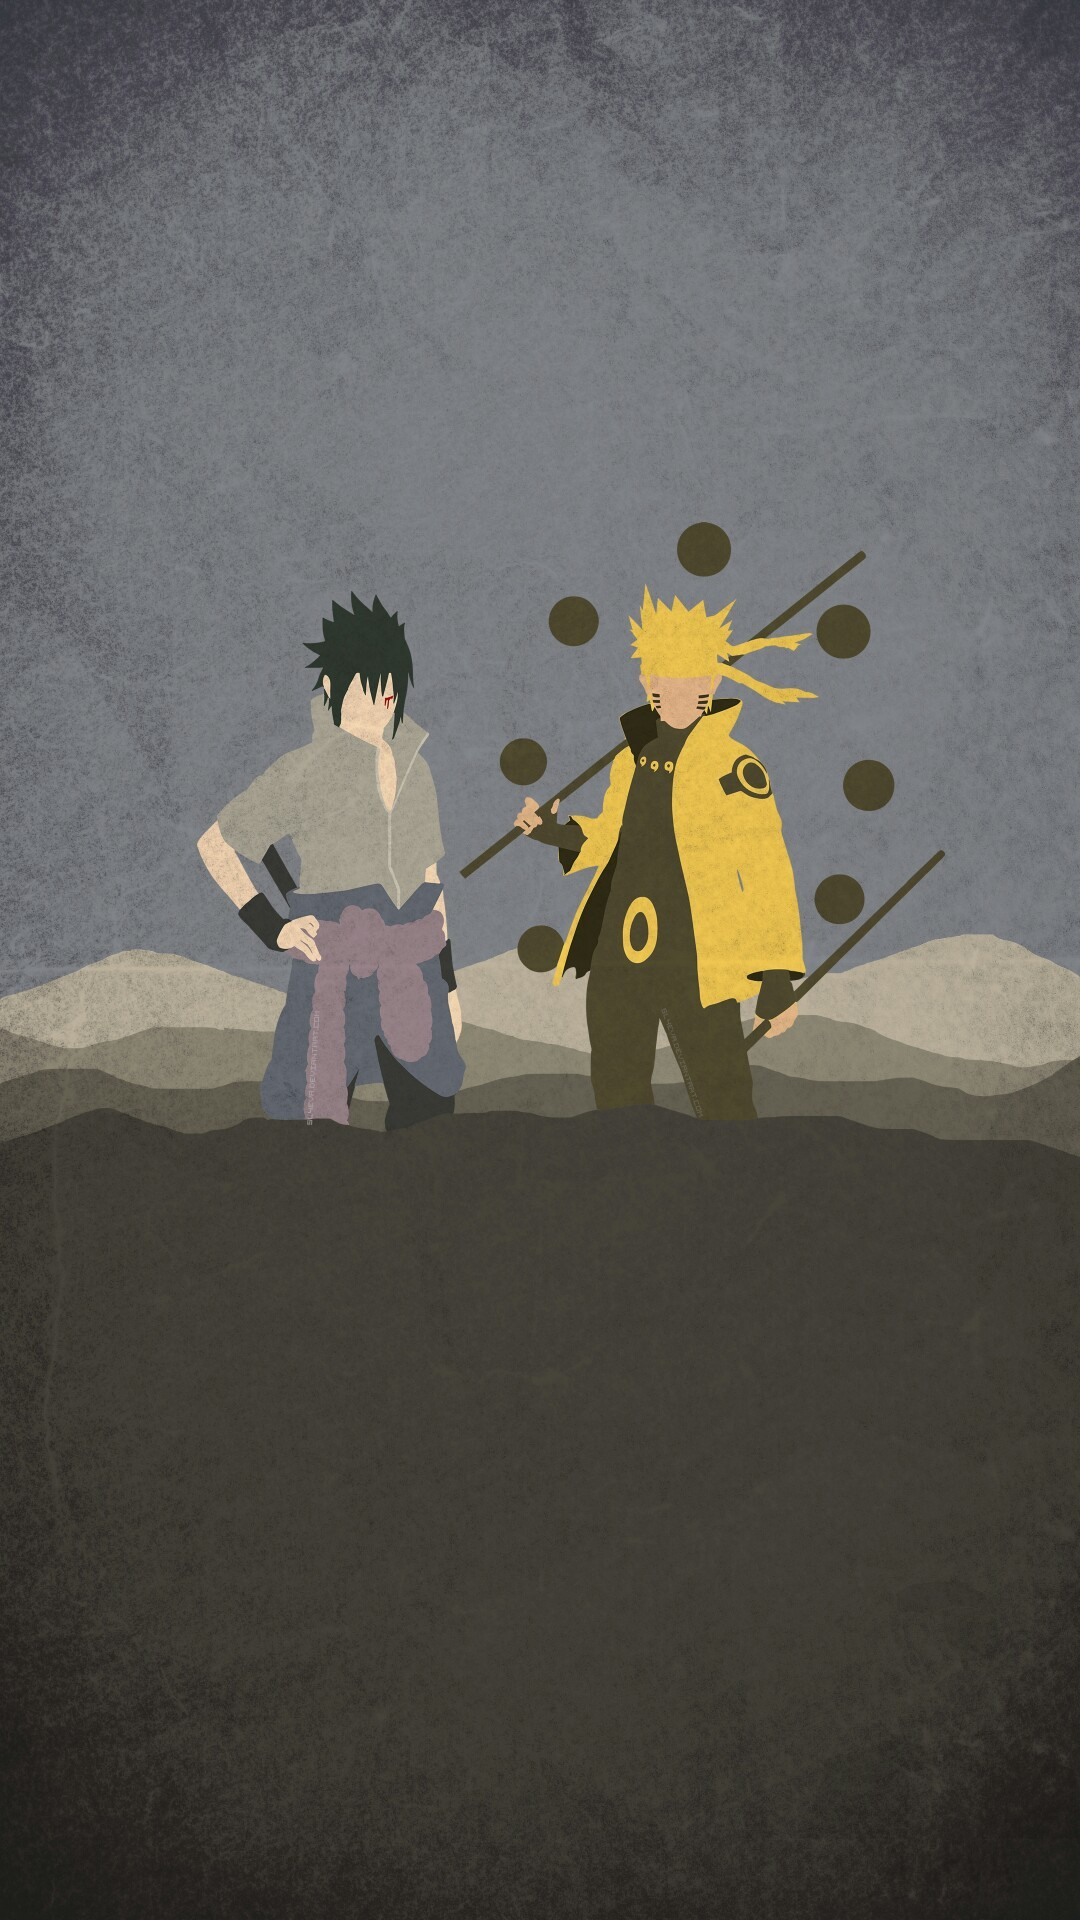 [4K] Naruto Minimal Mobile Wallpapers Remastered – https://sl4eva.deviantart